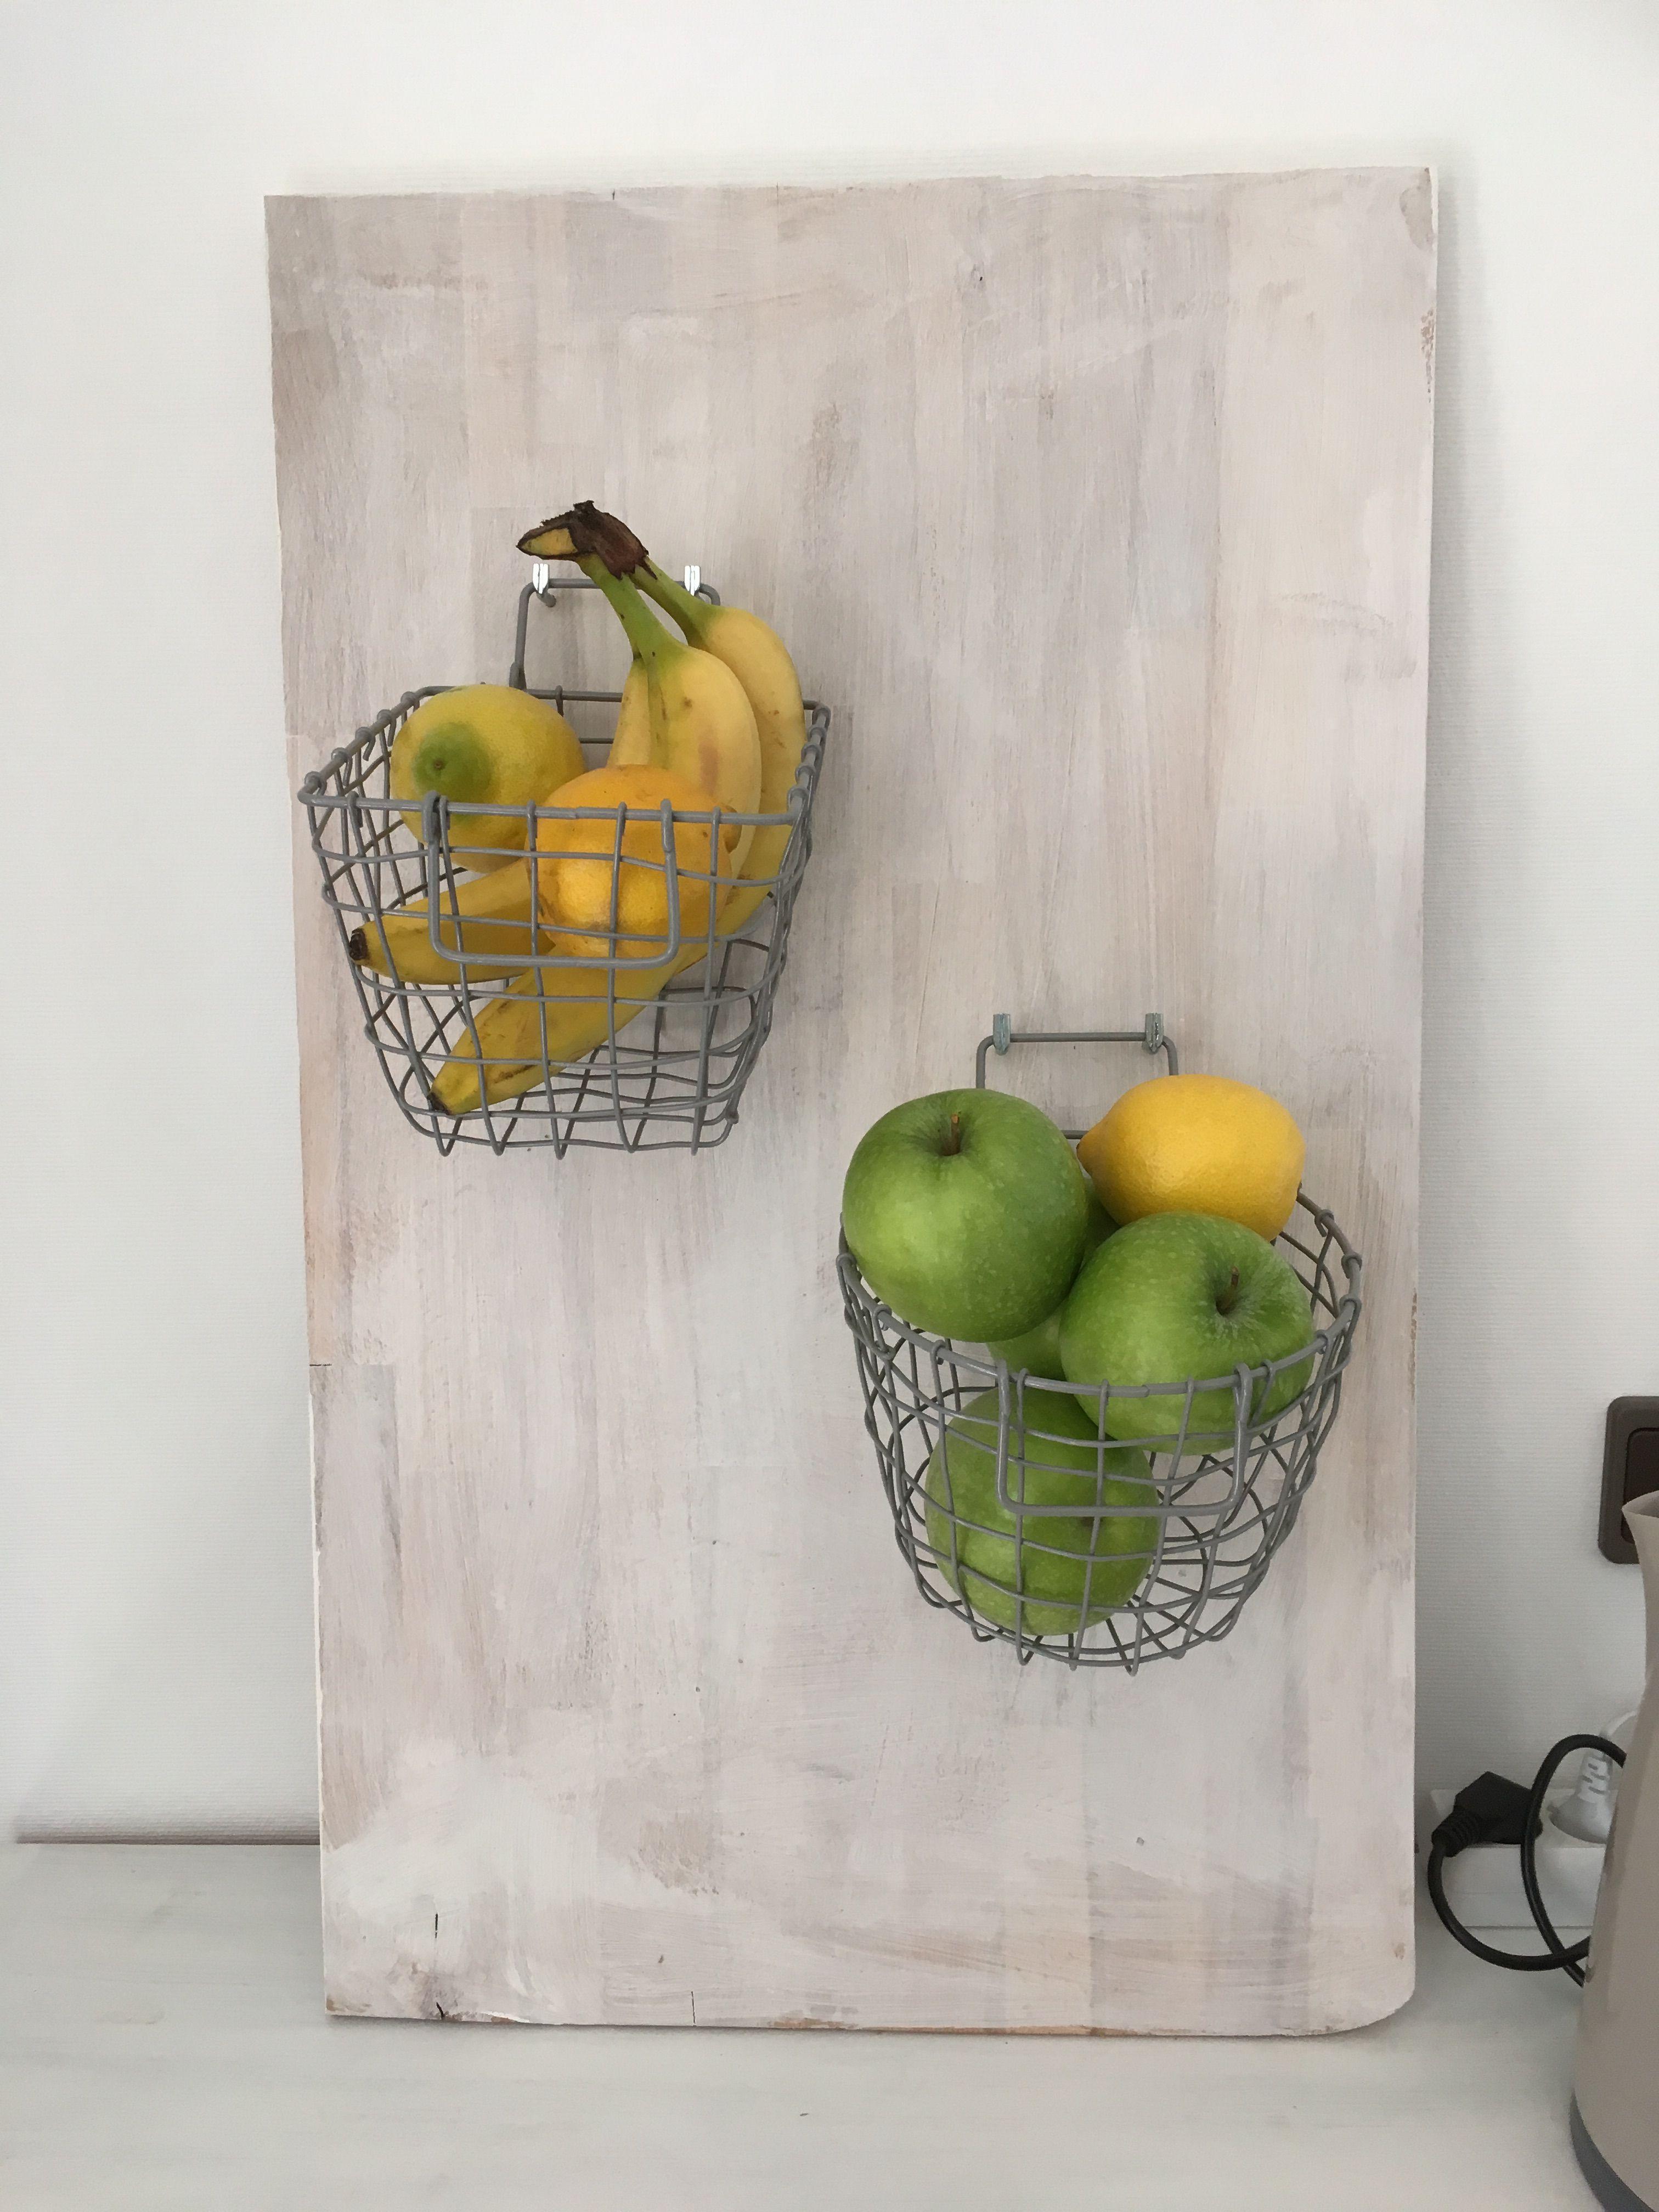 Holzbrett als Gemüse / Obst Aufbewahrung umfunktioniert ...